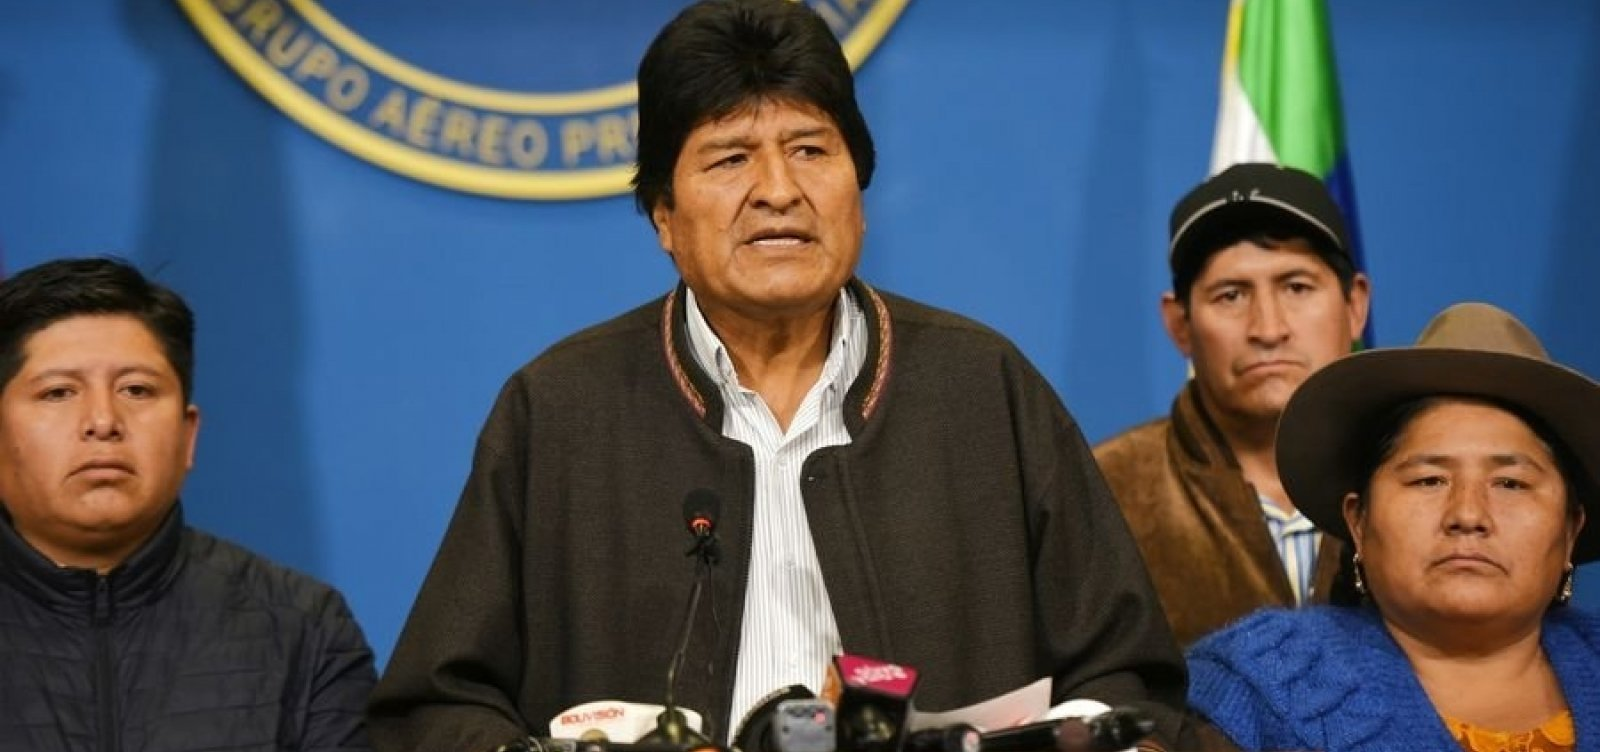 Evo Morales é acusado de terrorismo por ministro boliviano